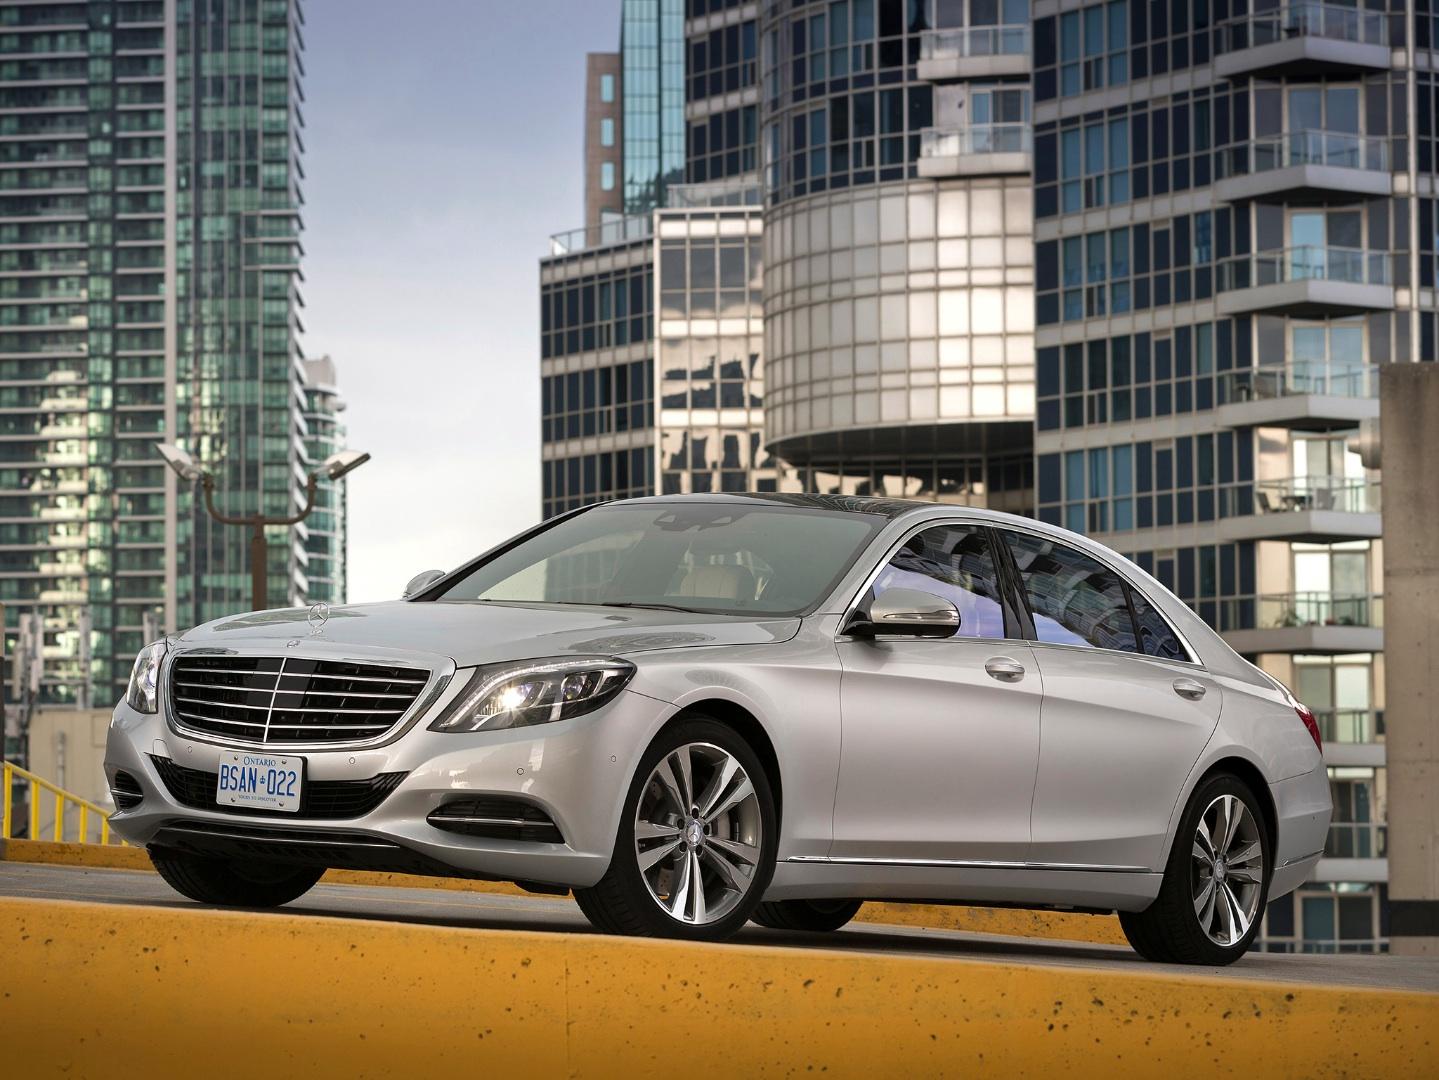 Mercedes benz wants european regulations in canada for Mercedes benz europe